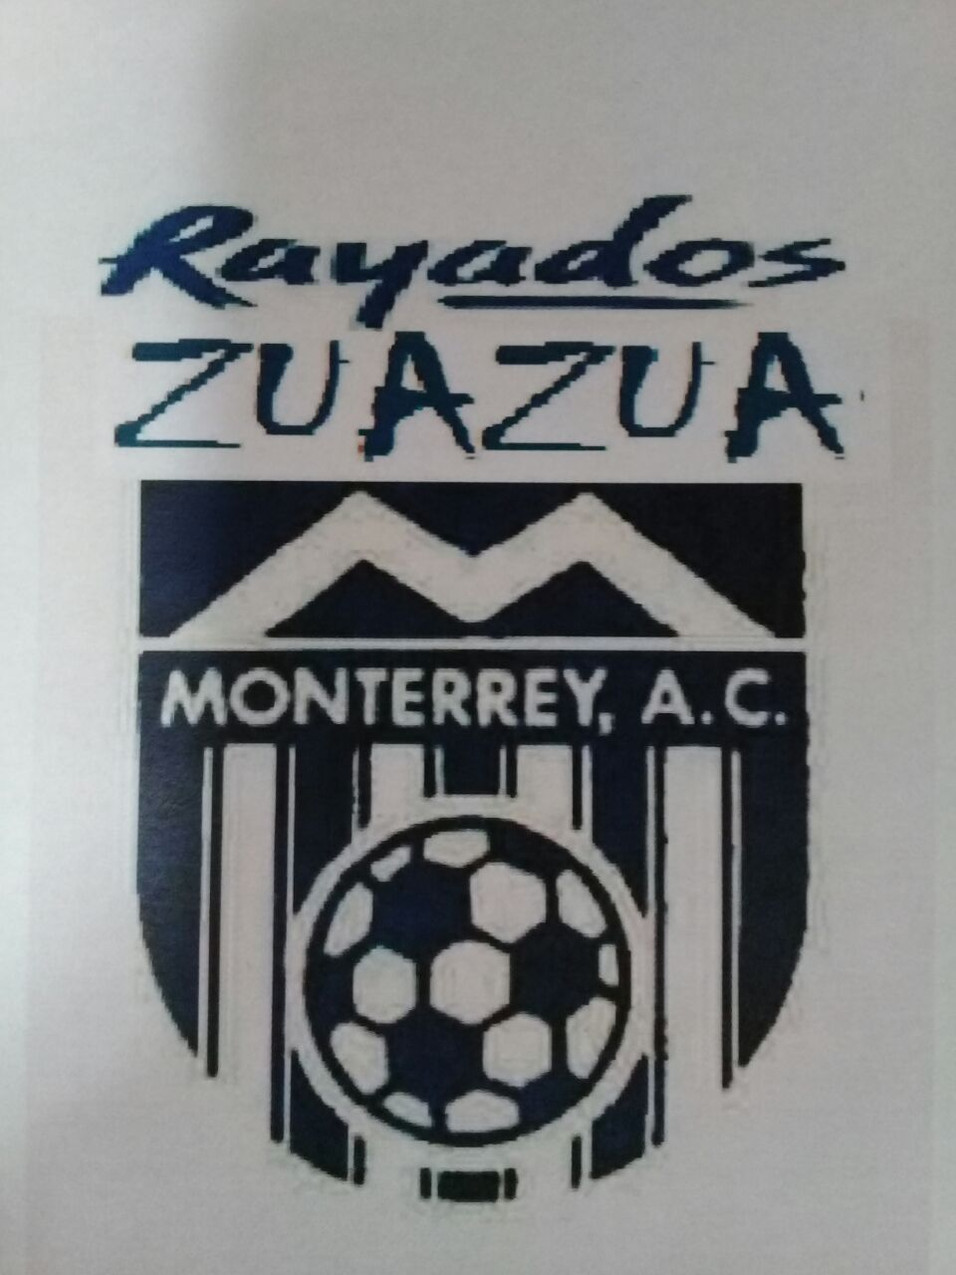 Escudo Rayados Zuazua